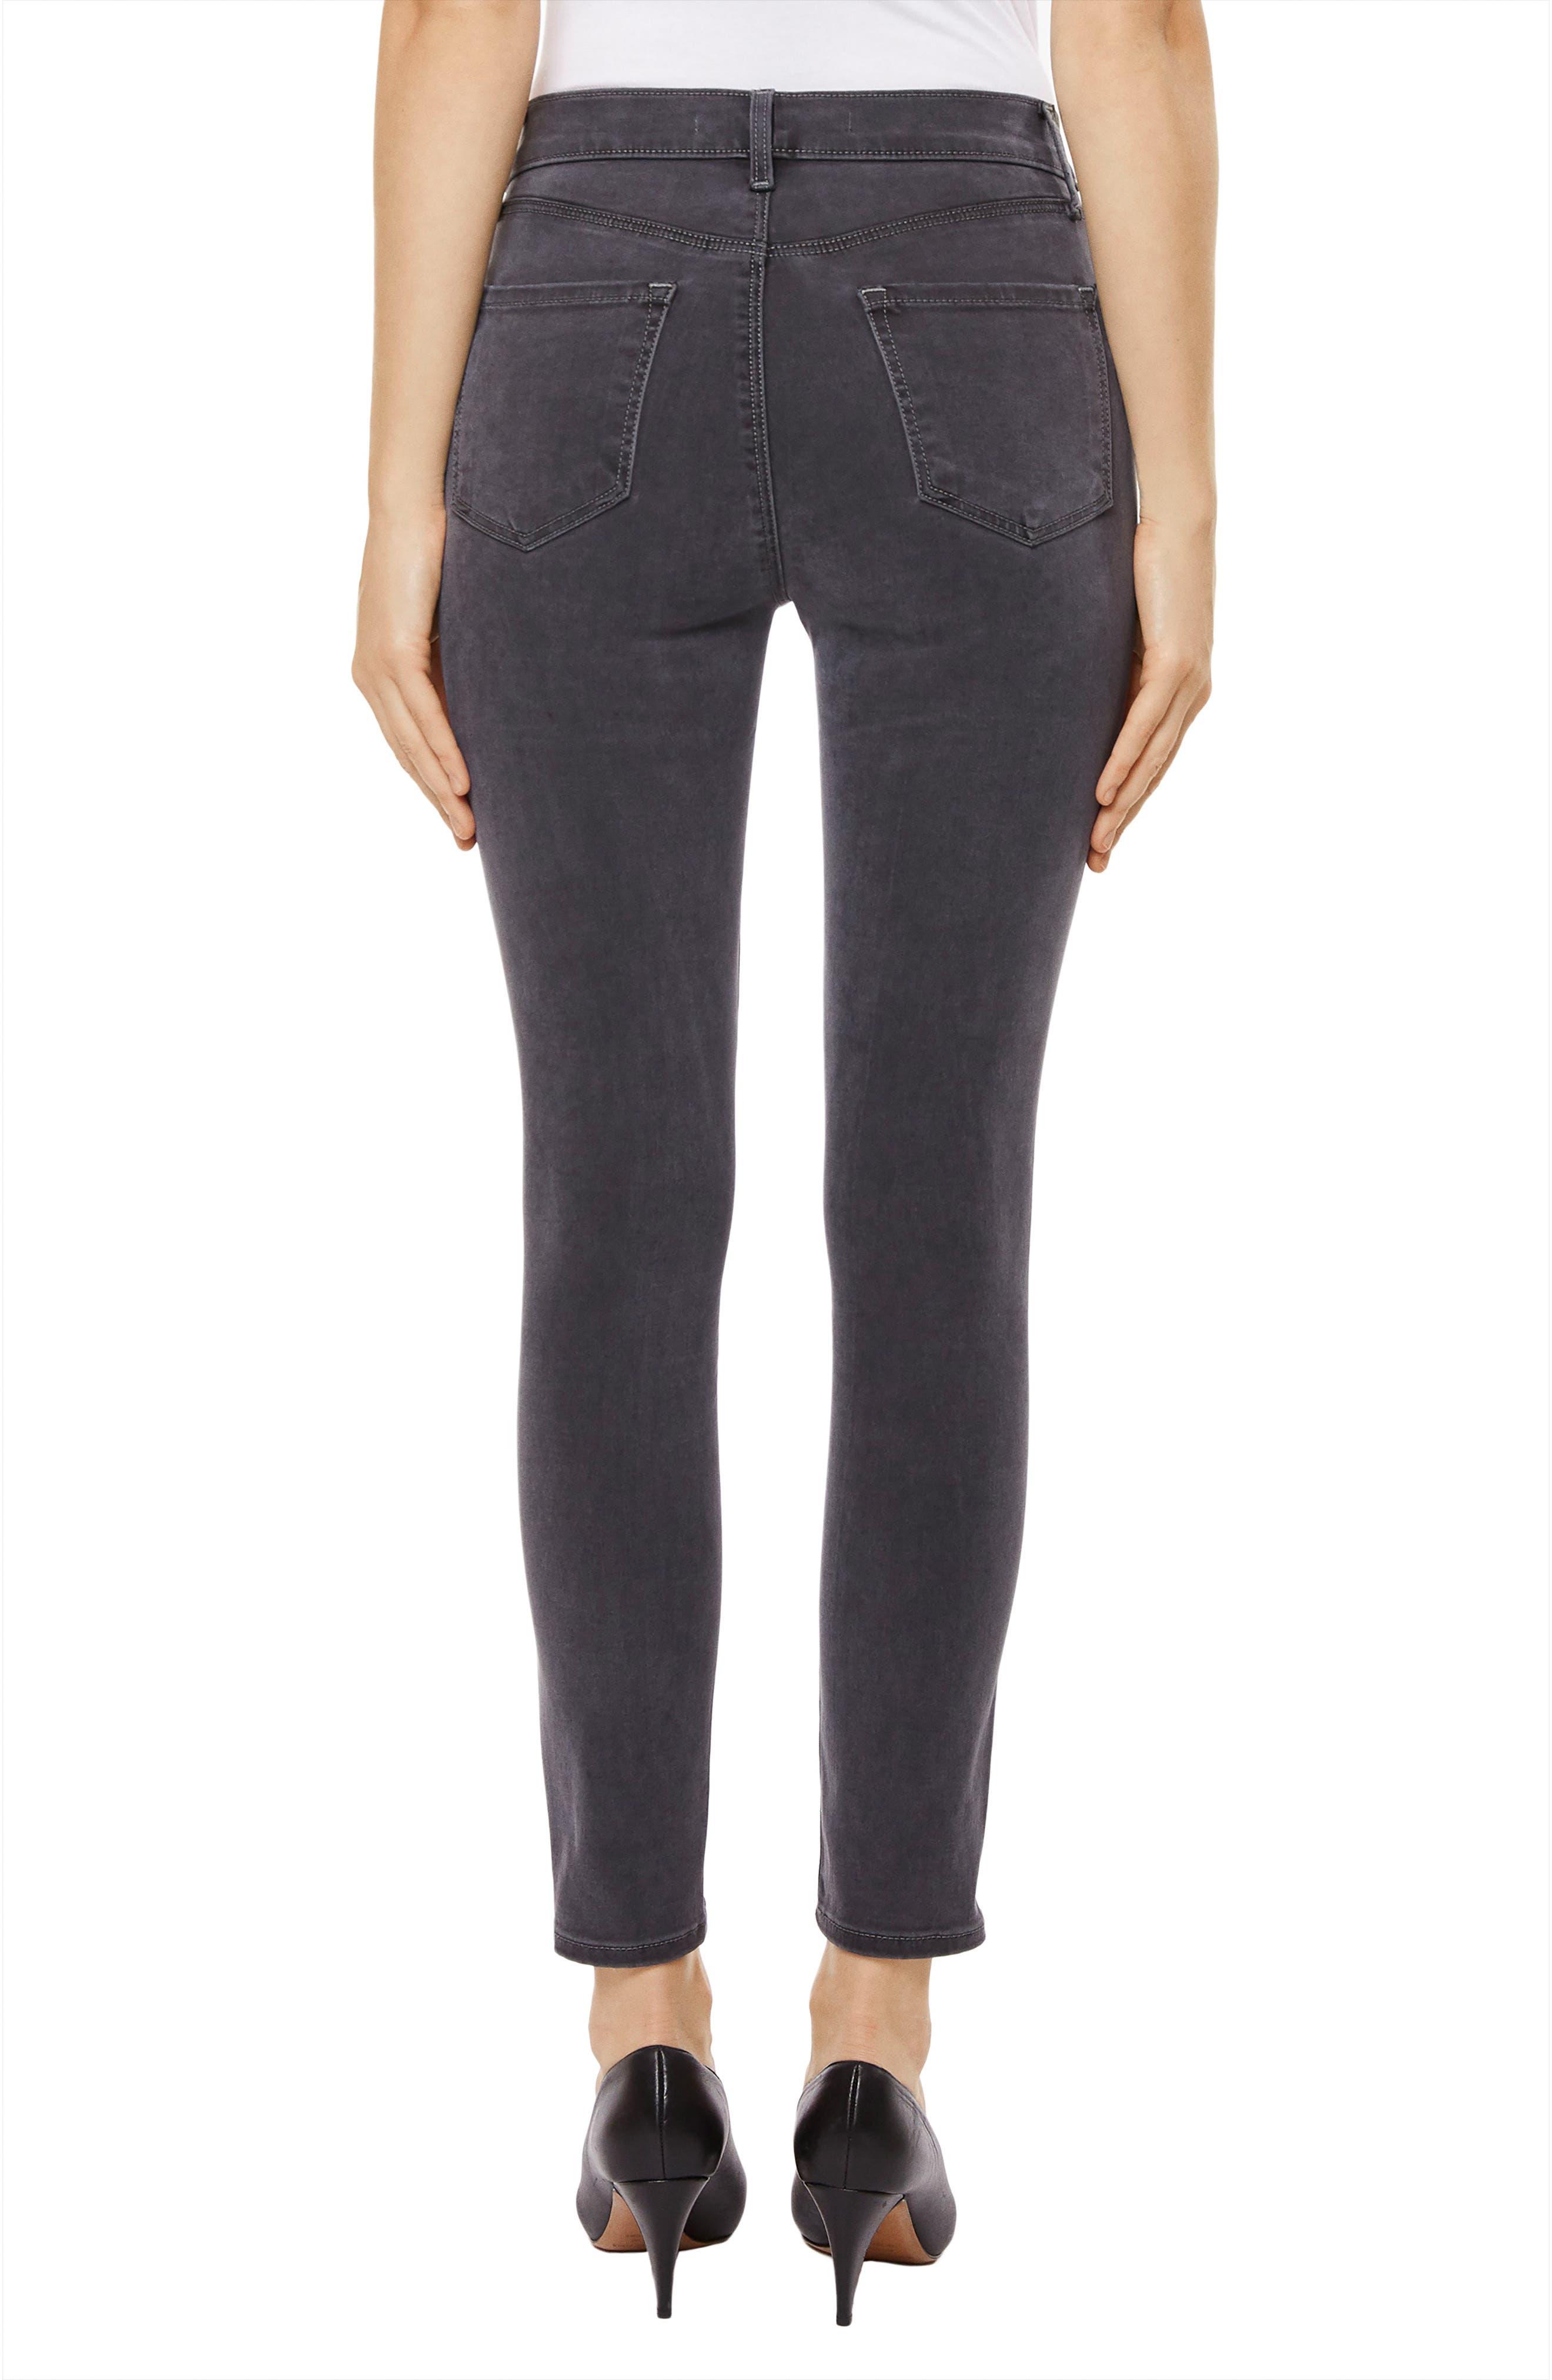 Alana High Waist Crop Skinny Jeans,                             Alternate thumbnail 2, color,